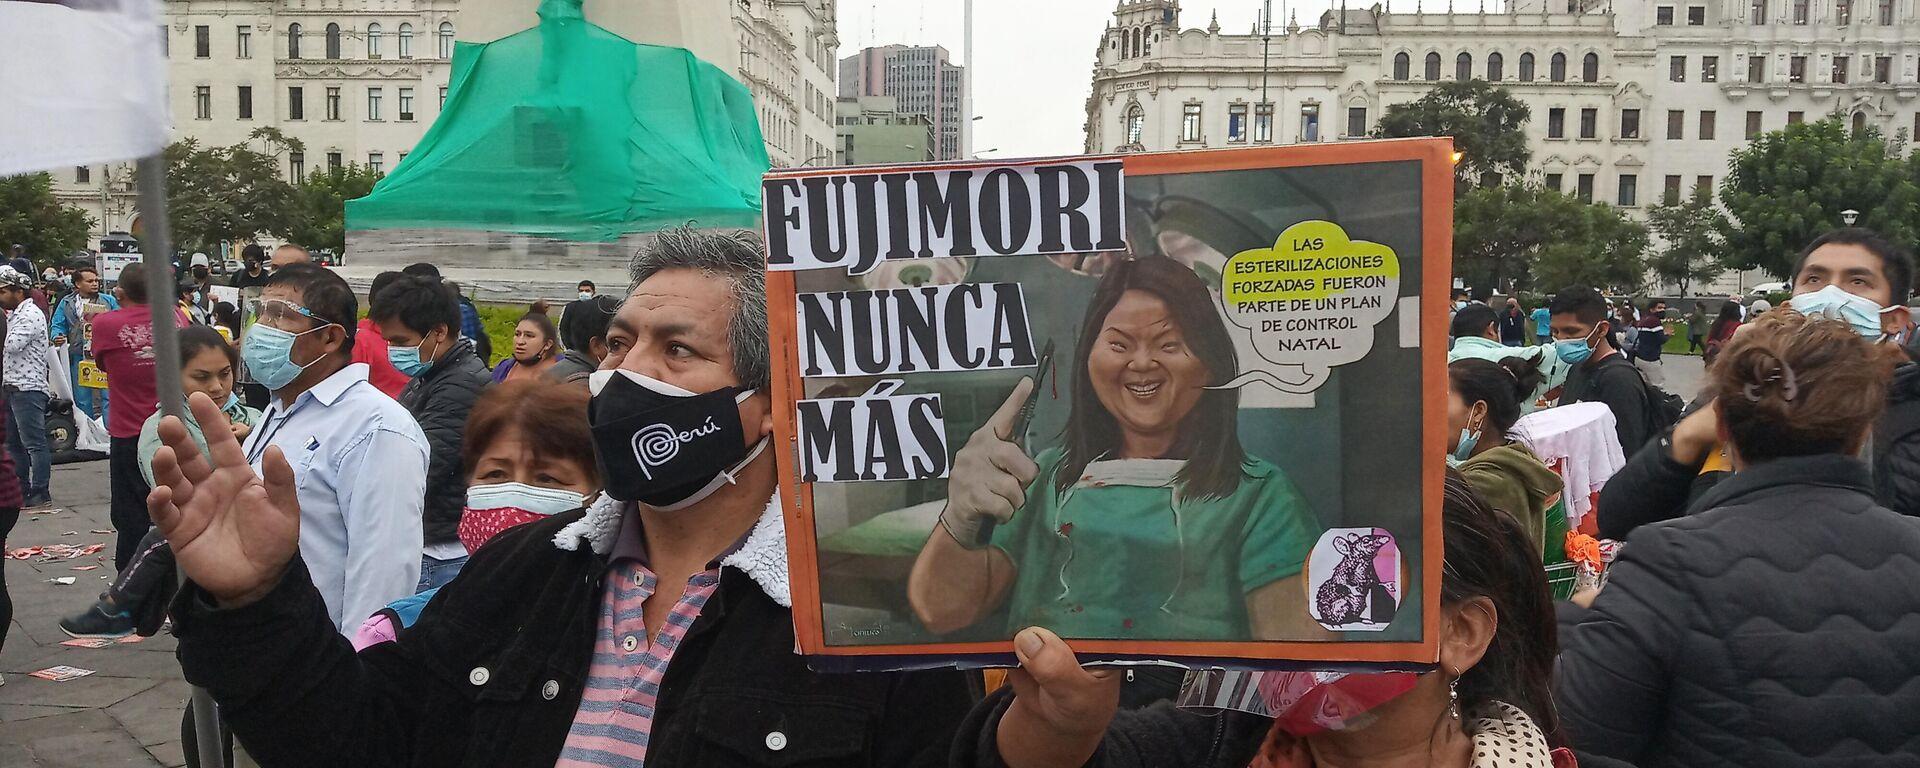 Rosa Elvira sosteniendo un cartel contra Keiko Fujimori - Sputnik Mundo, 1920, 25.06.2021